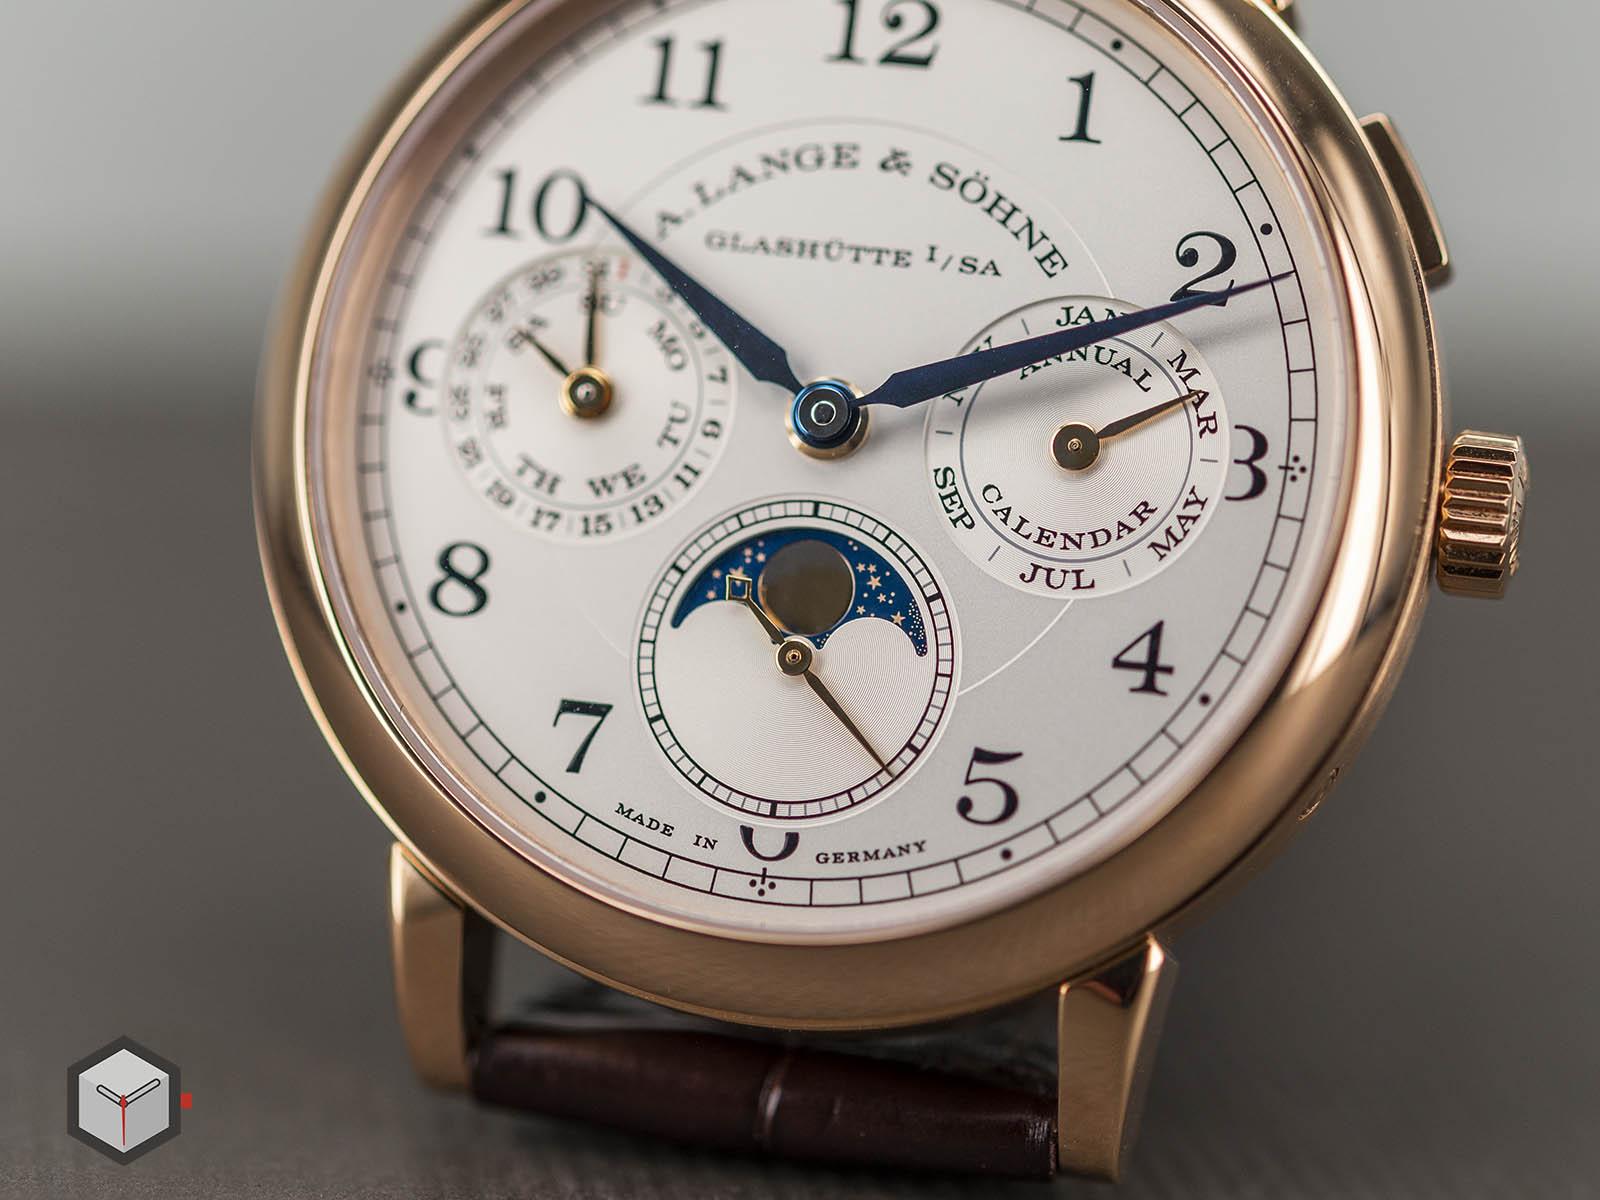 238-032-a-lange-sohne-1815-annual-calendar-18k-pink-gold-6.jpg